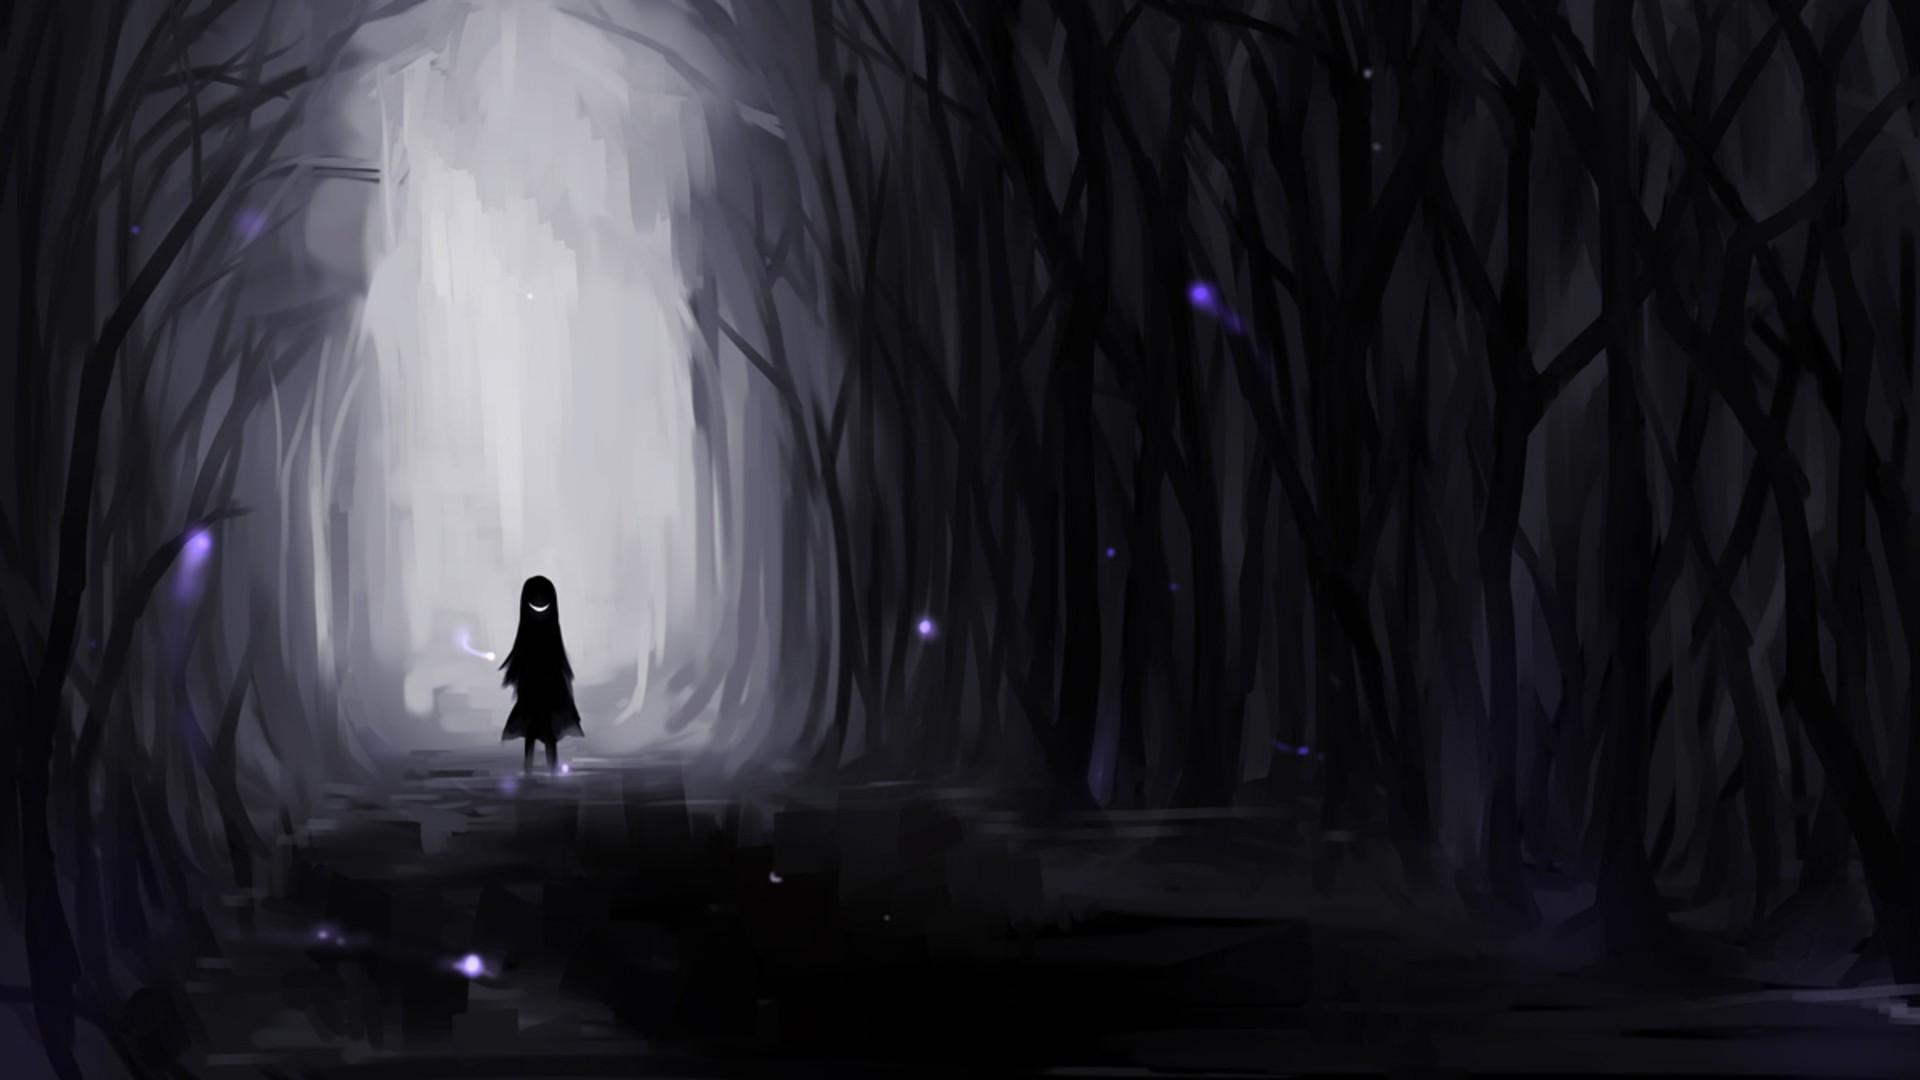 Dark Anime Forest wallpaper   766201 1920x1080